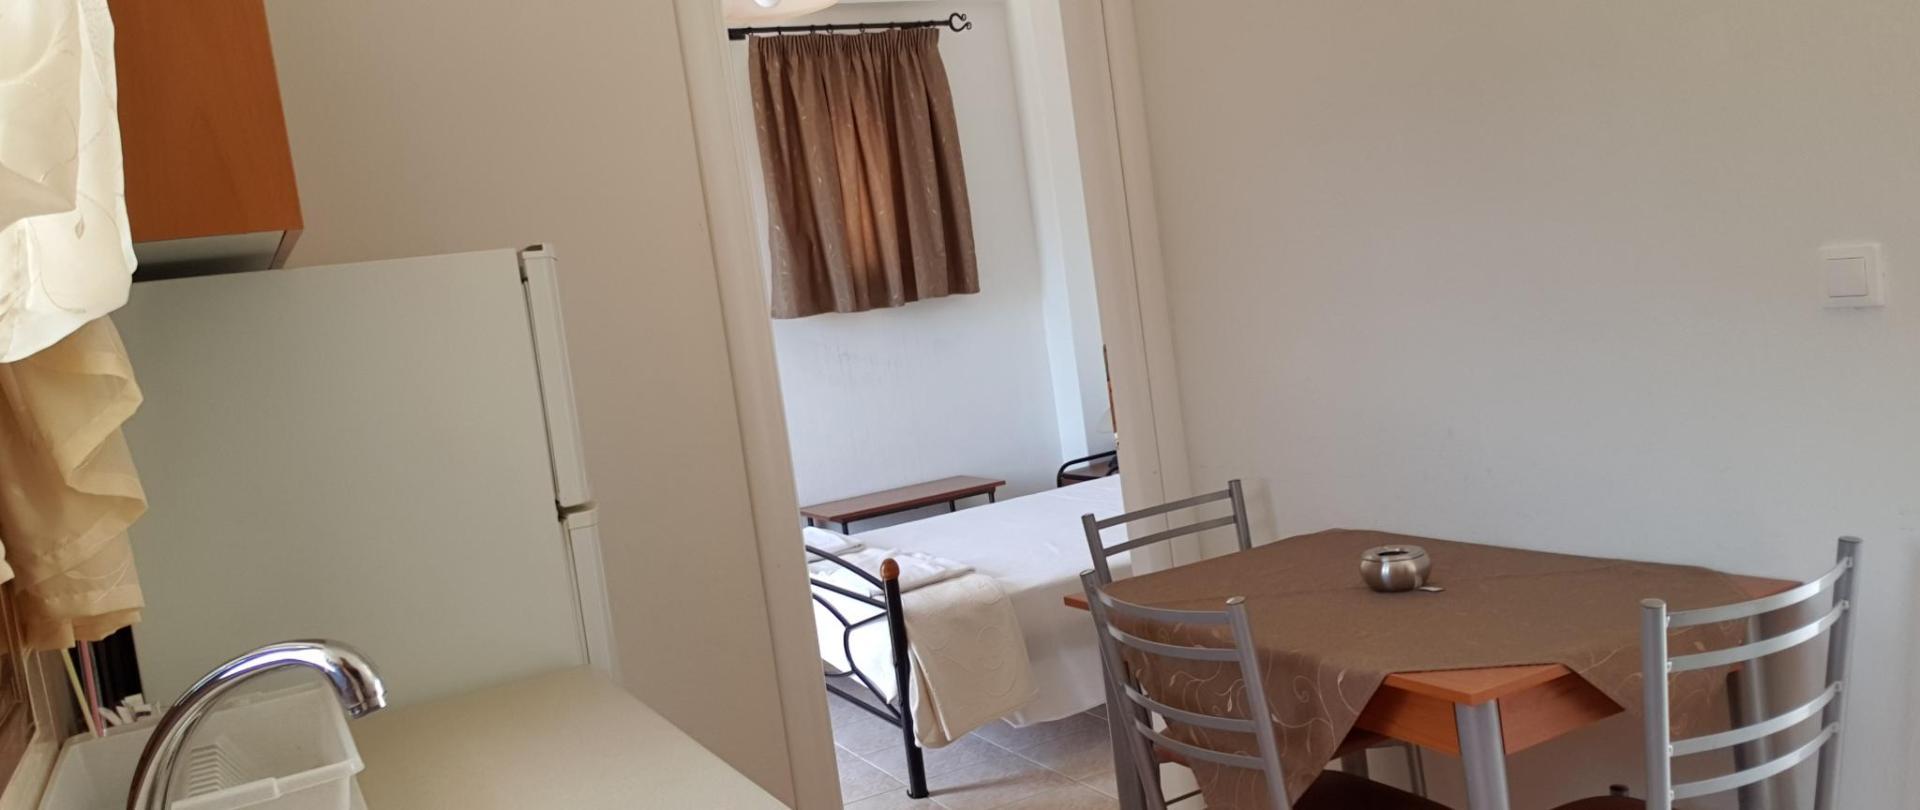 Domaine Papakonstantis Apartments To Let